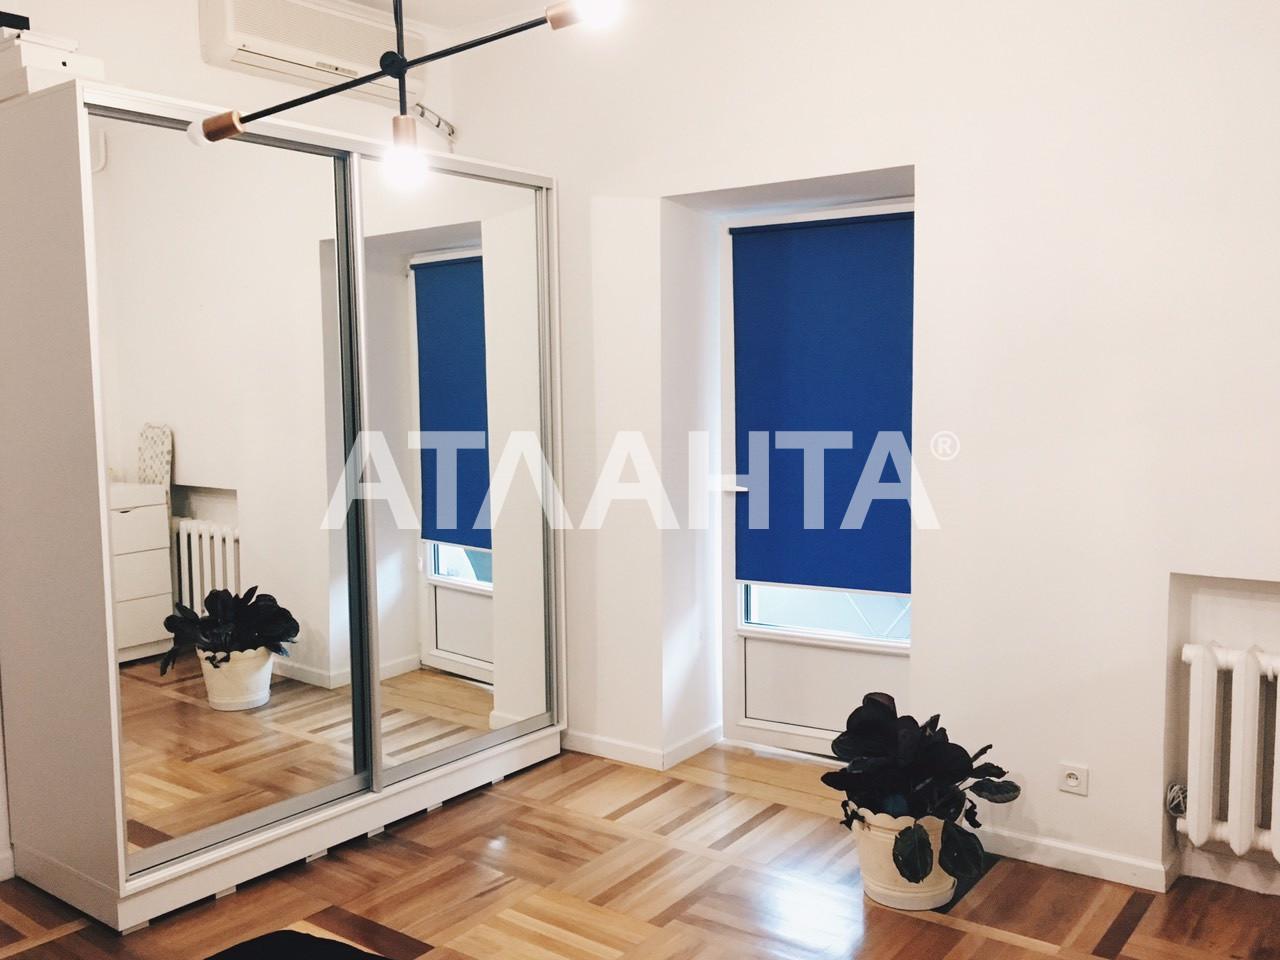 Продается 2-комнатная Квартира на ул. Семинарская (Гамарника) — 75 000 у.е. (фото №3)